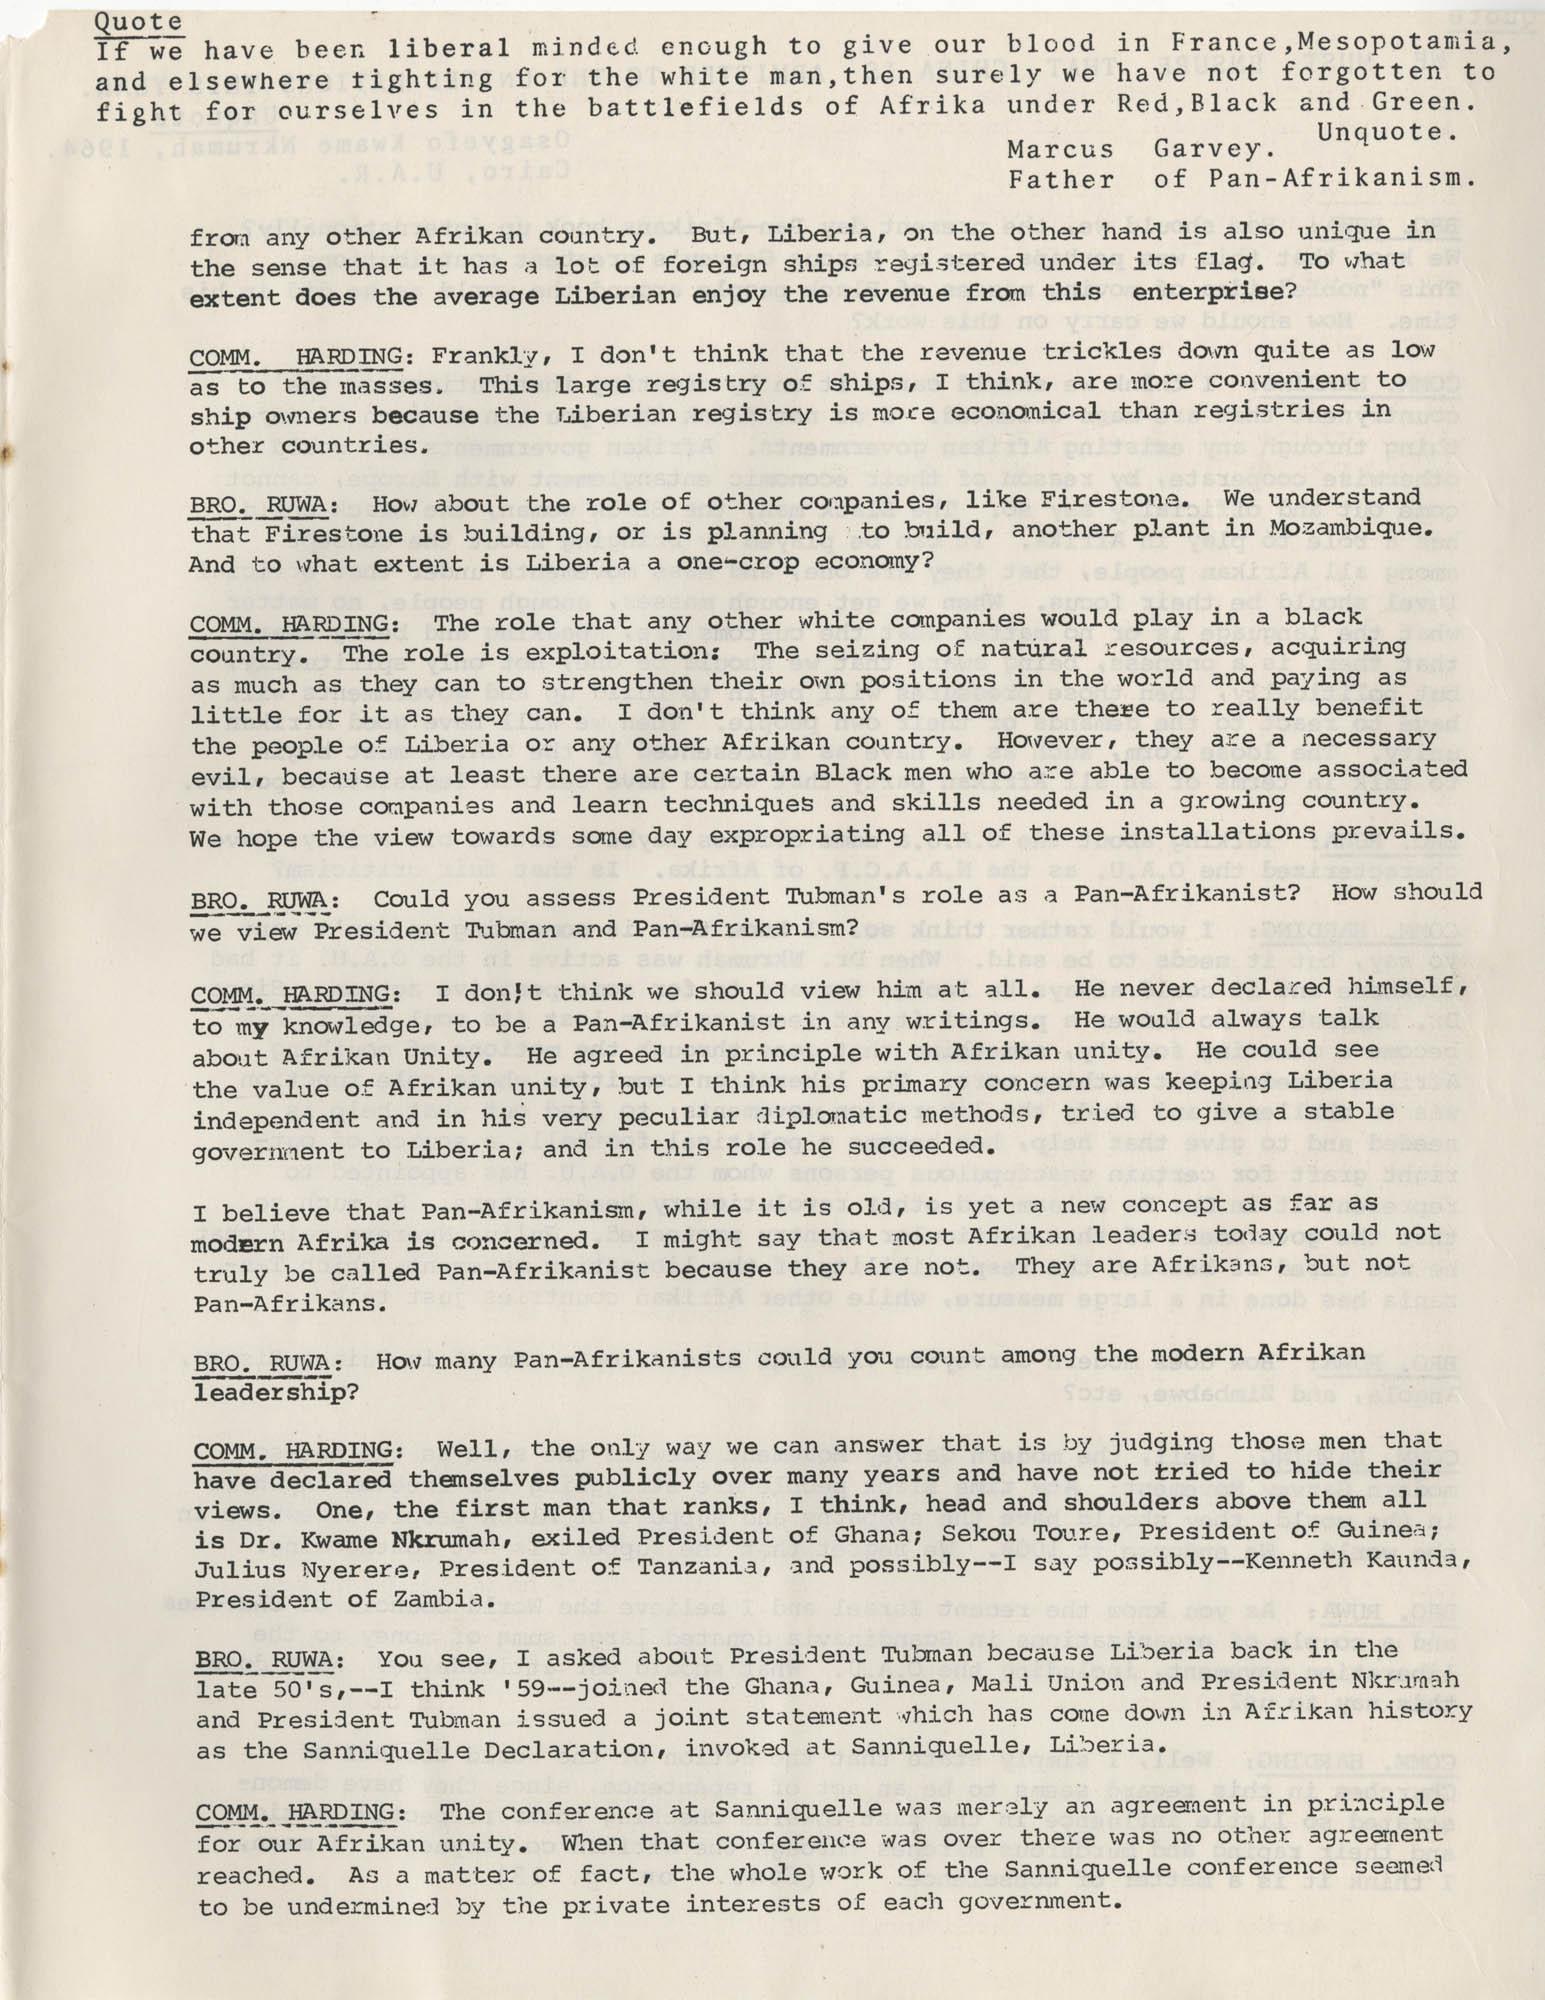 Afrika Must Unite, Vol. 1, No. 4, Page 9